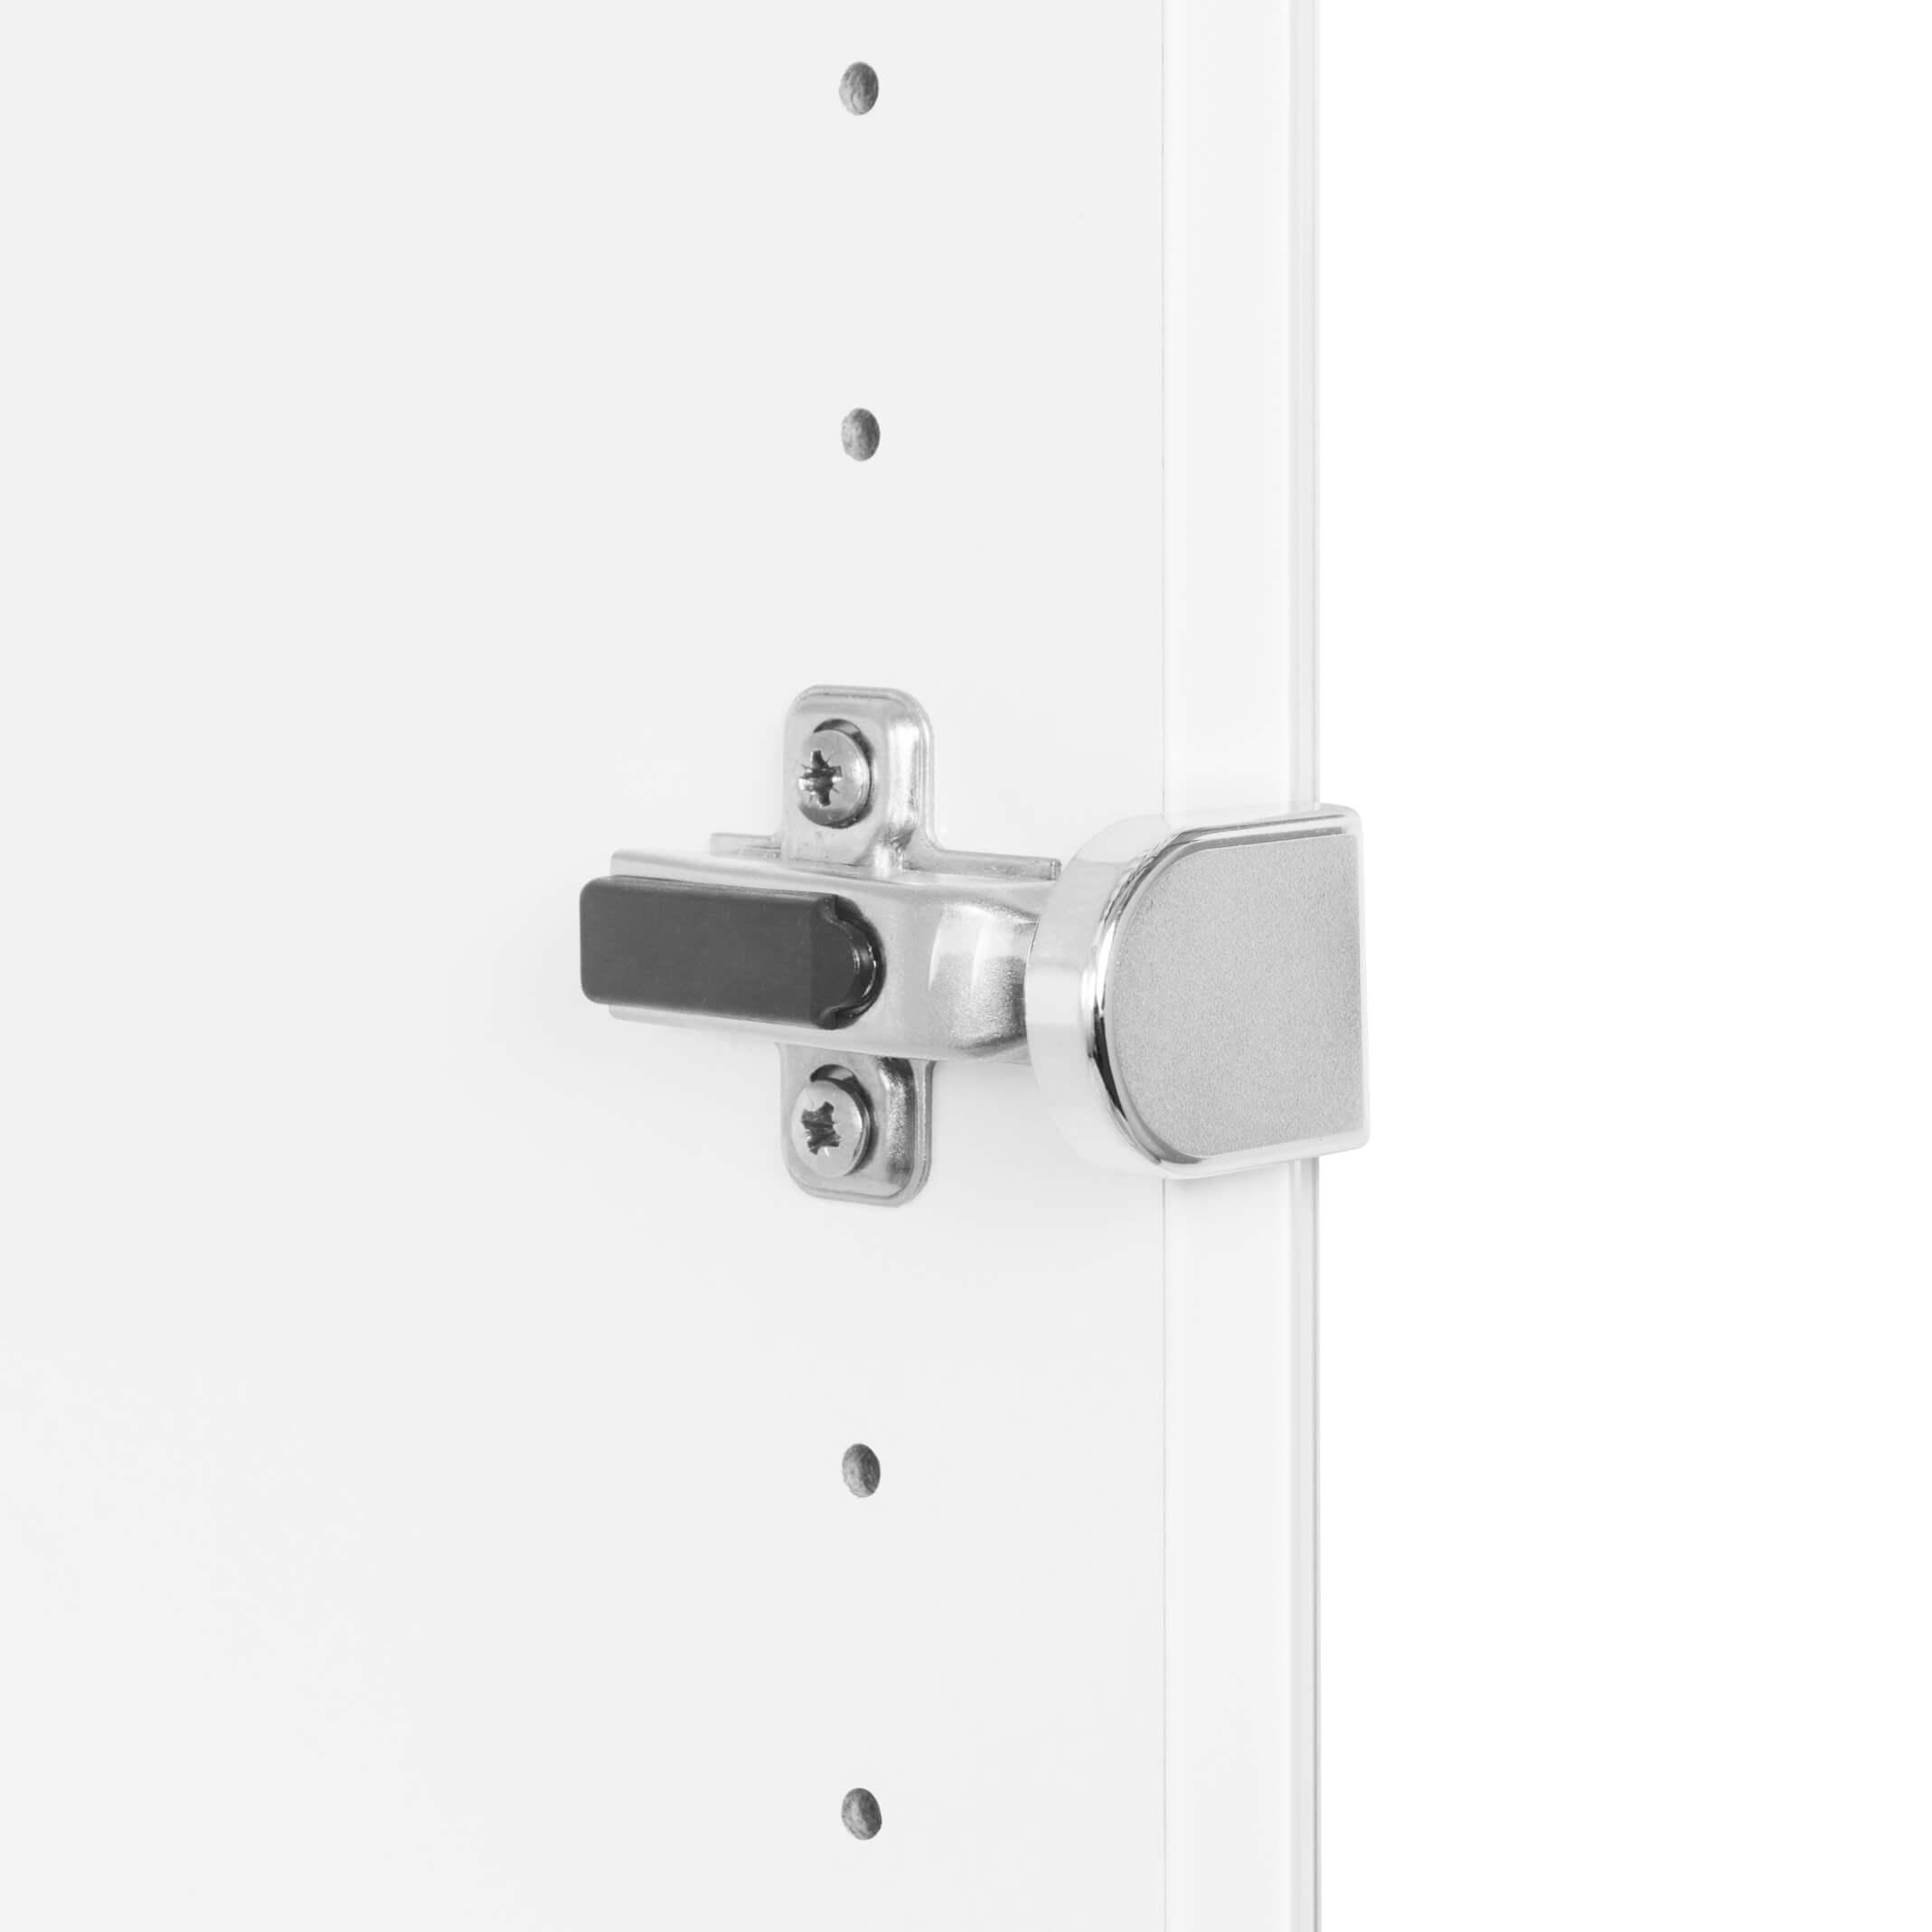 PROFI Vitrinenschrank abschließbar 5 OH Weiß Schrank Büroschrank Flügeltürenschrank